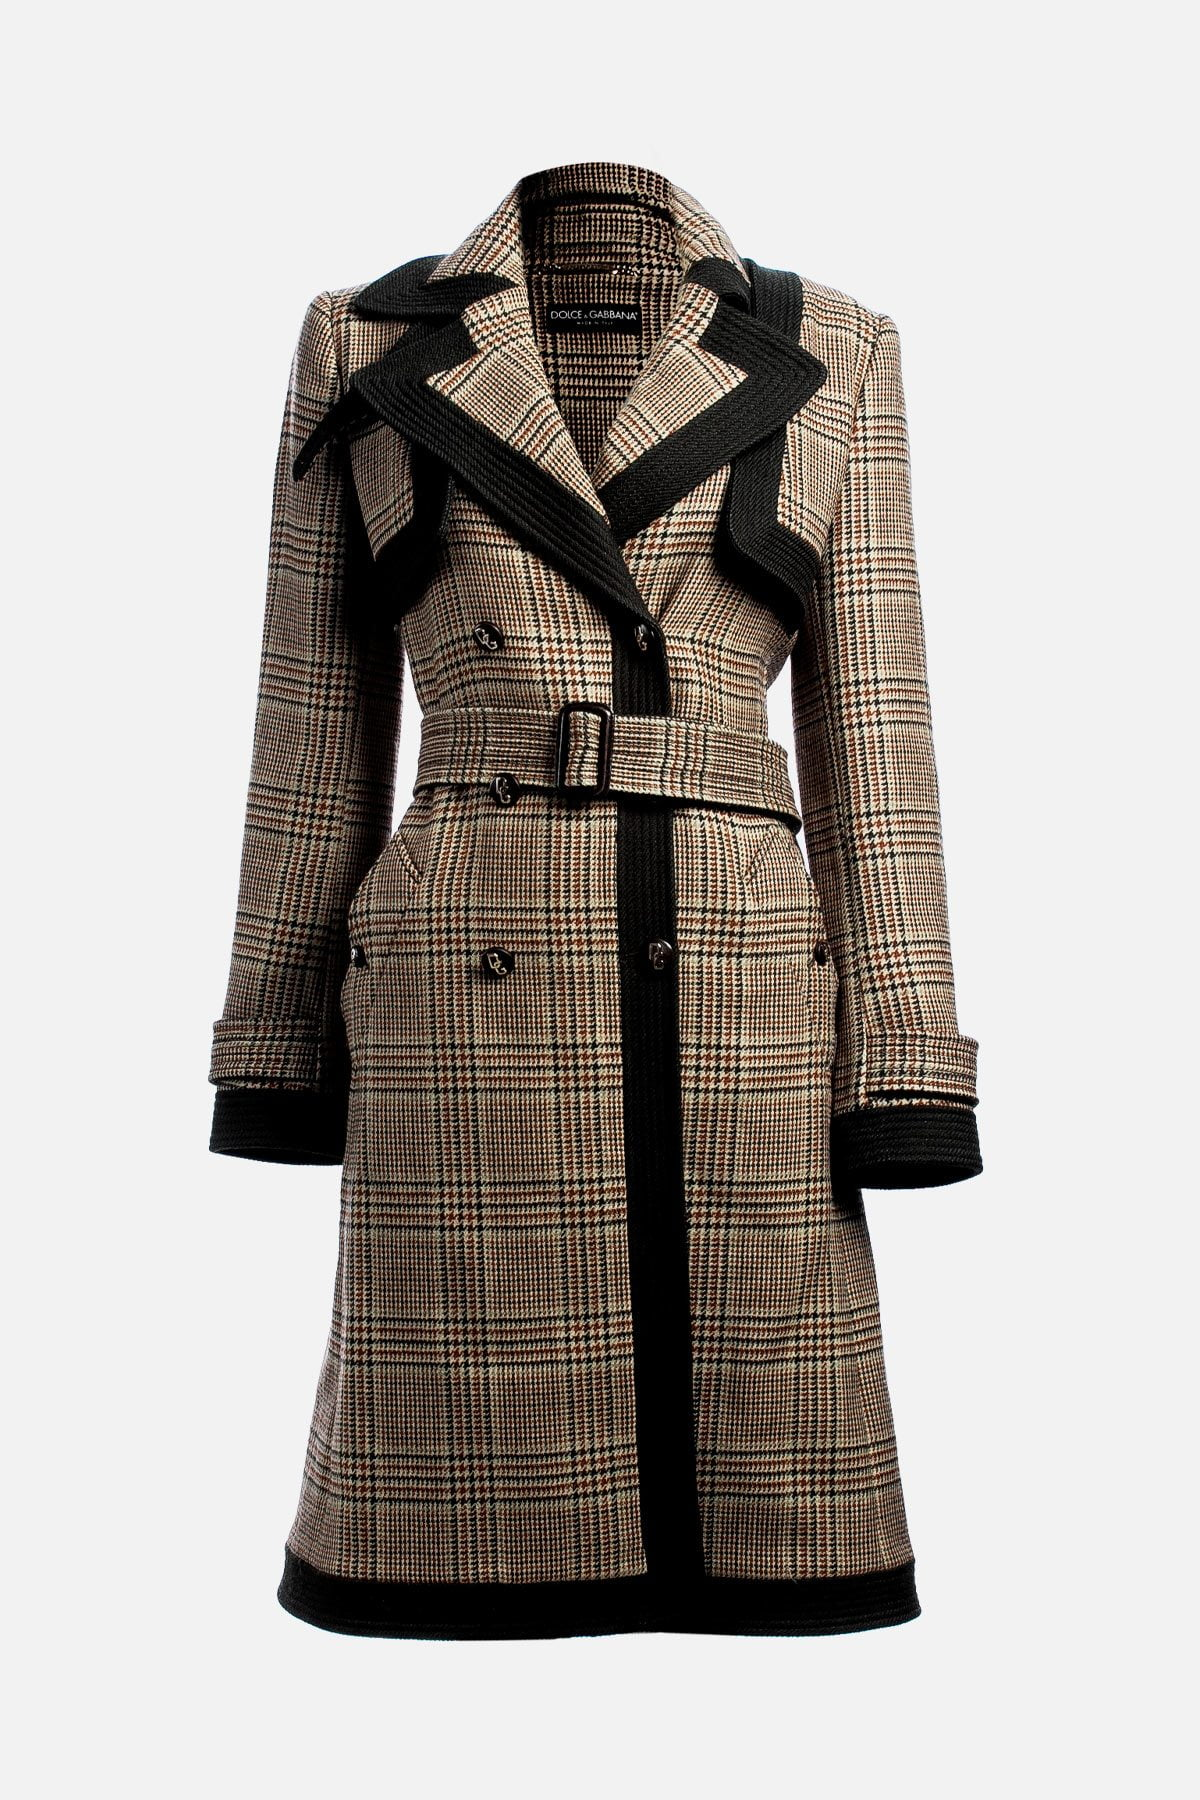 Virgin Wool Plaid Print Trench Coat